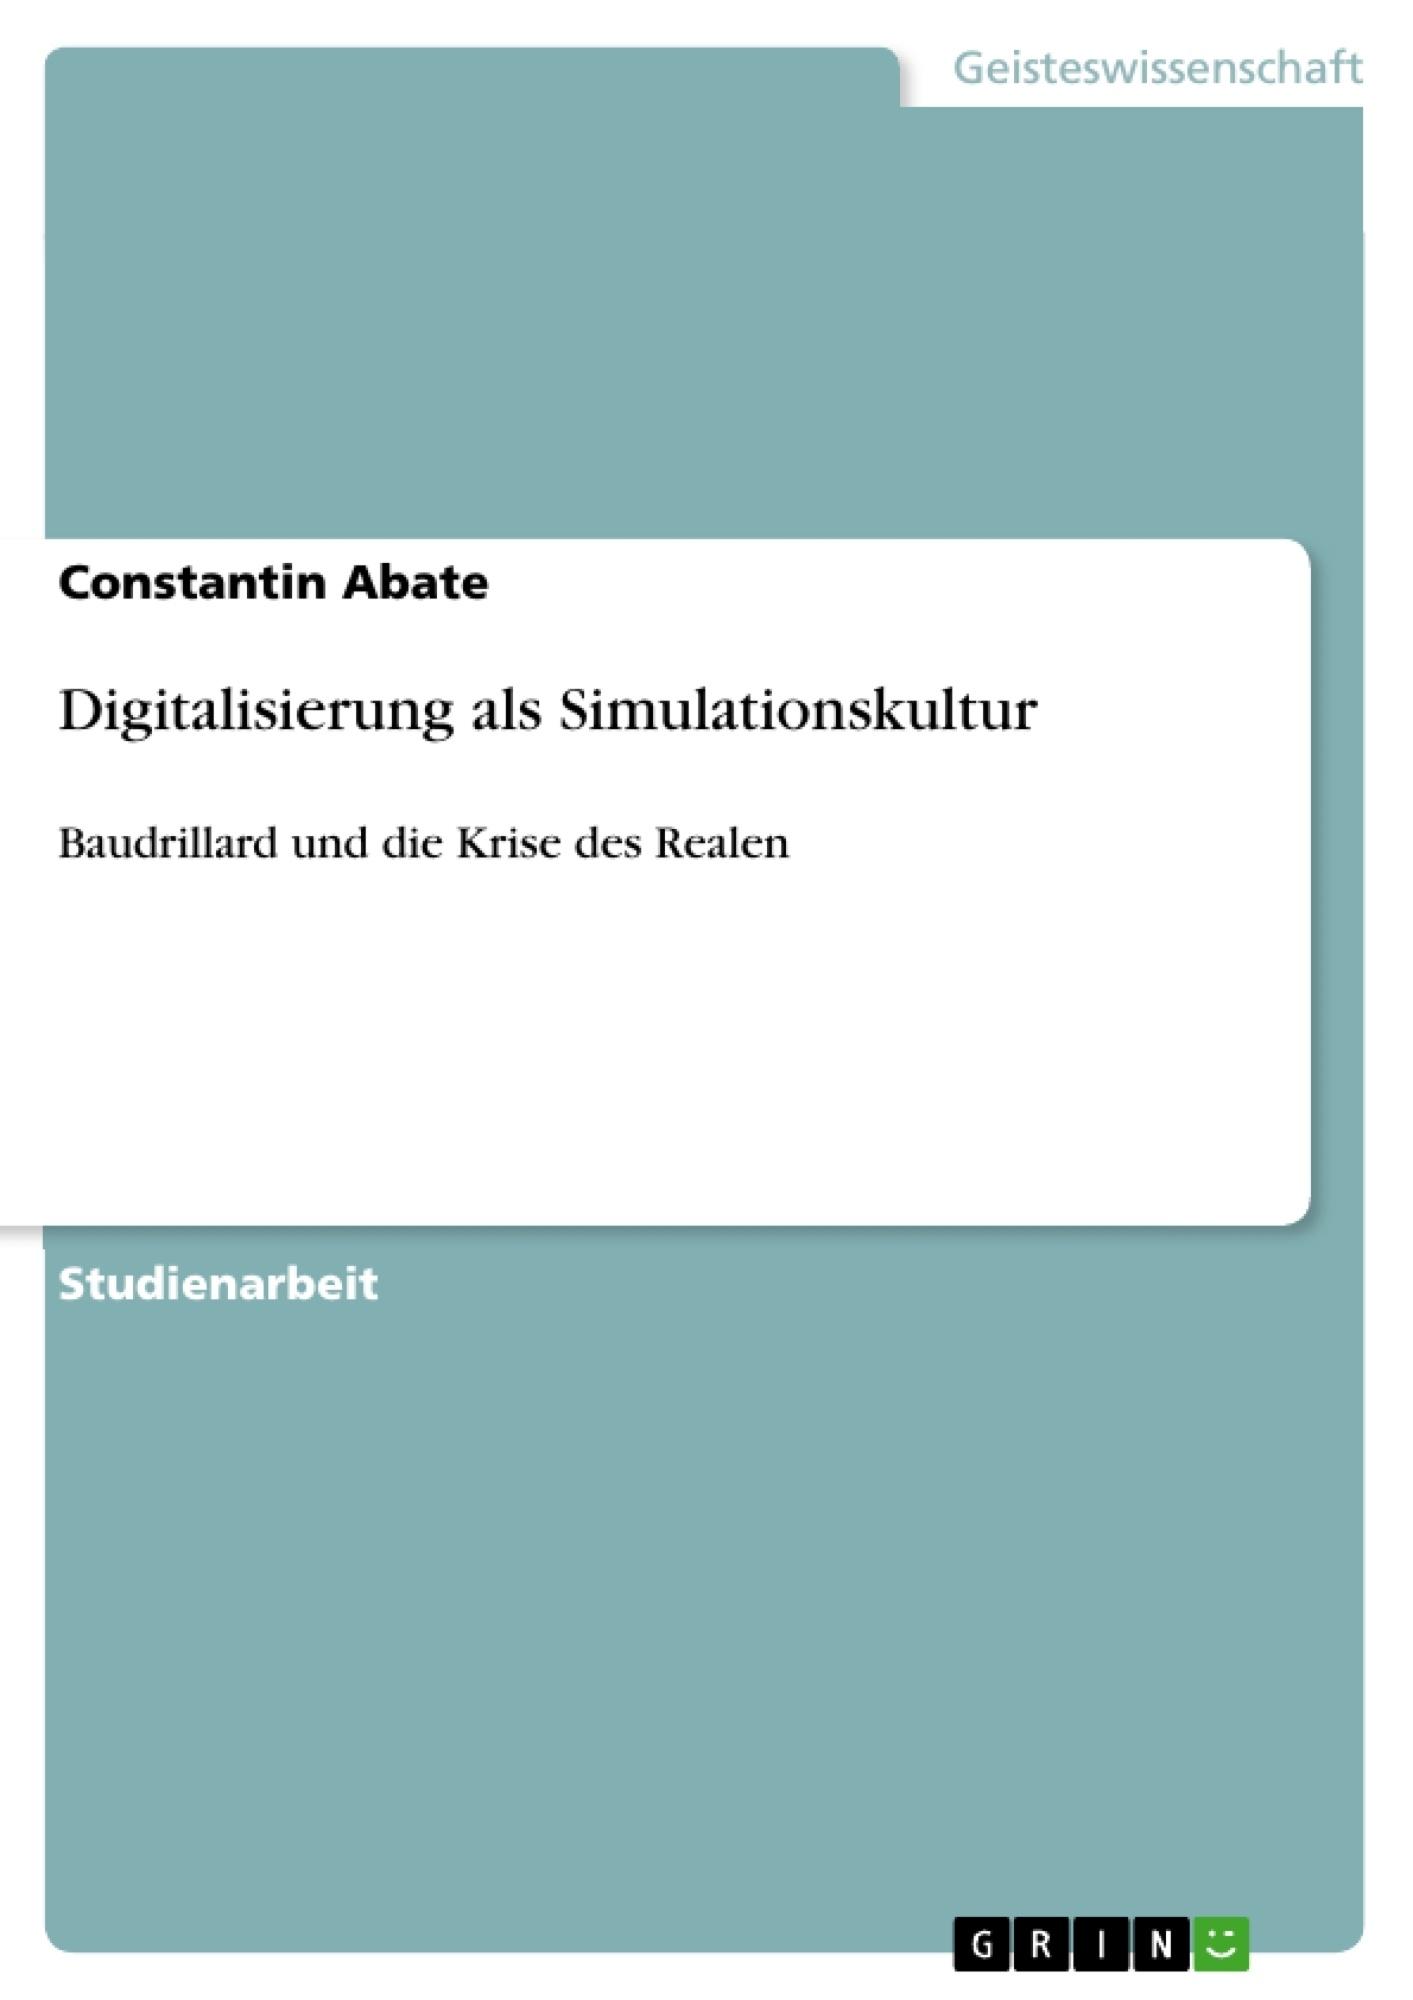 Titel: Digitalisierung als Simulationskultur